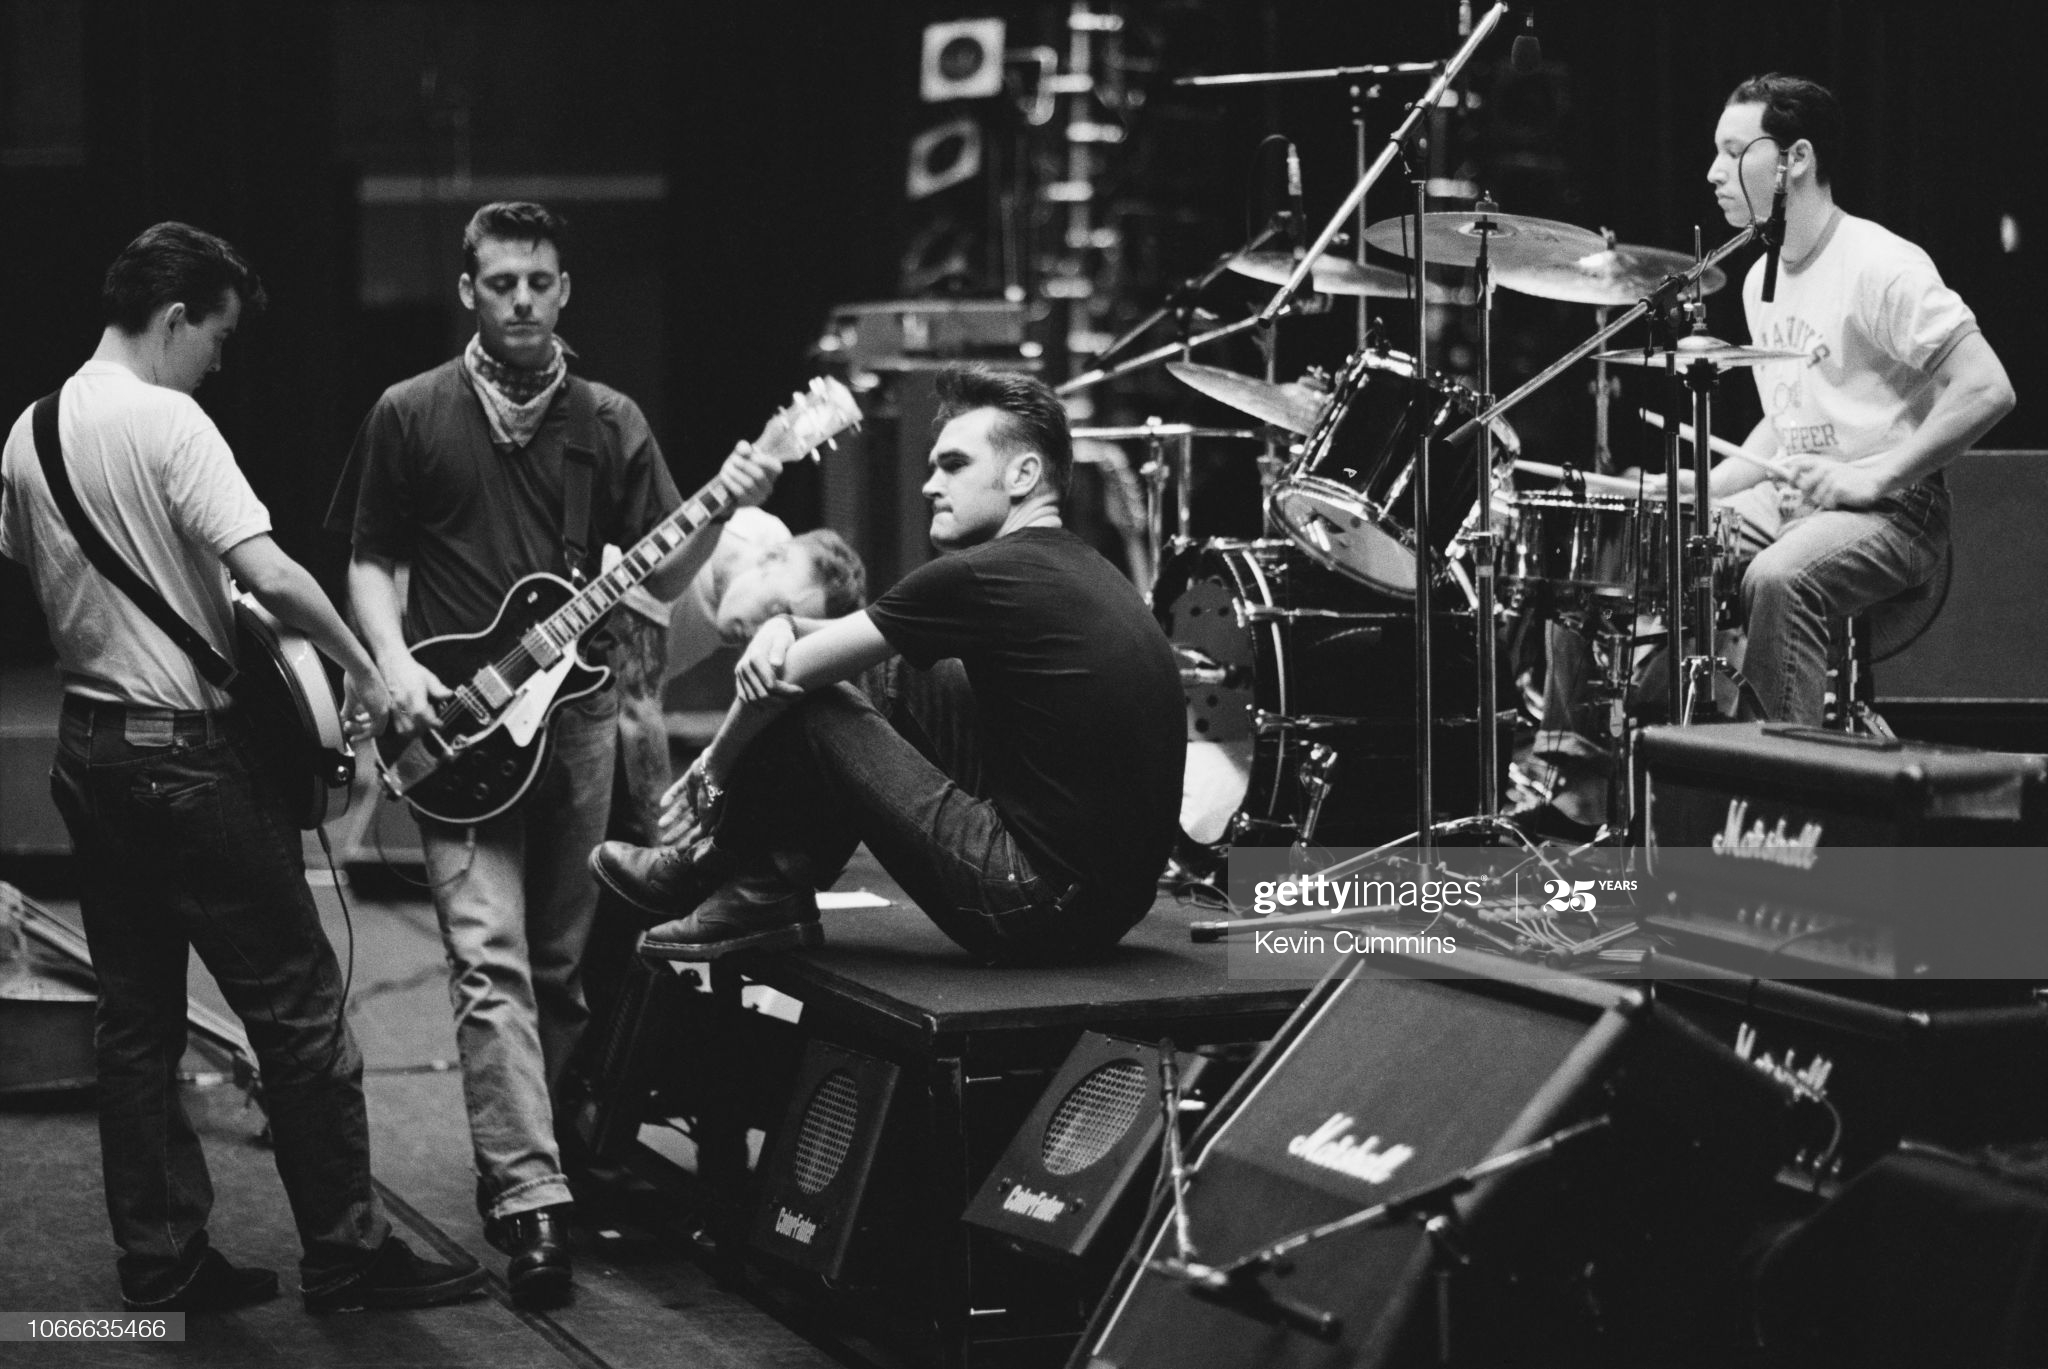 Morrissey ~ Japan September 5th 1991 (ii) Kevin Cummins.jpg